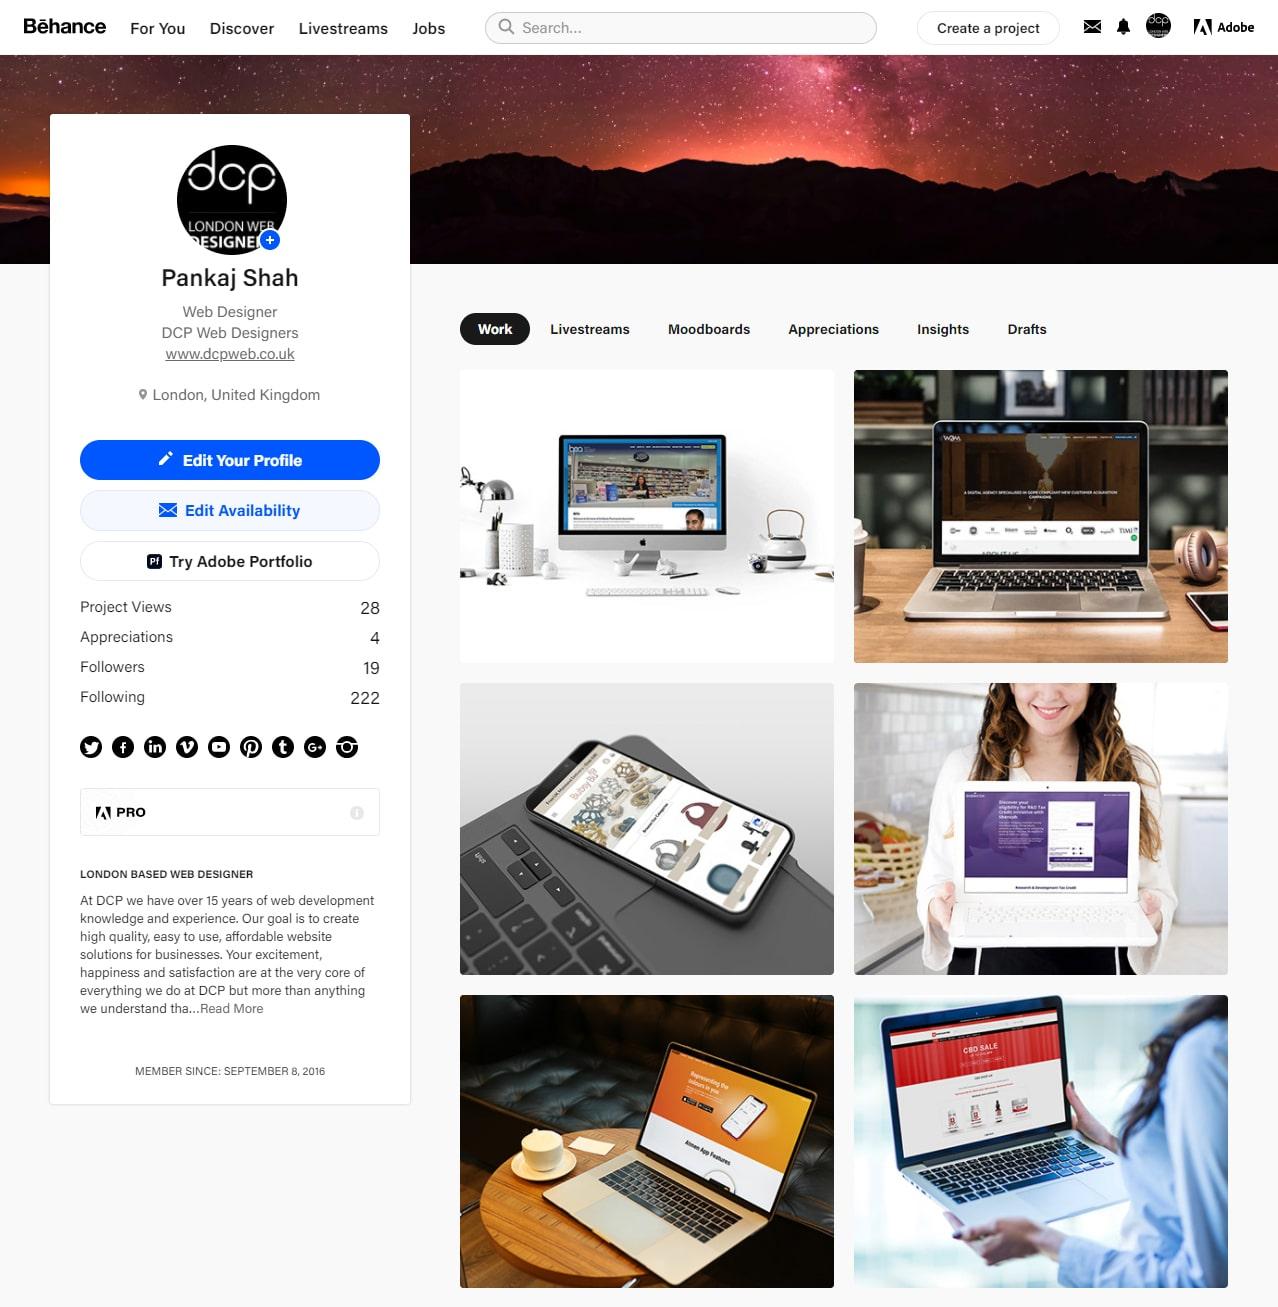 DCP Web Designers Behance Profile